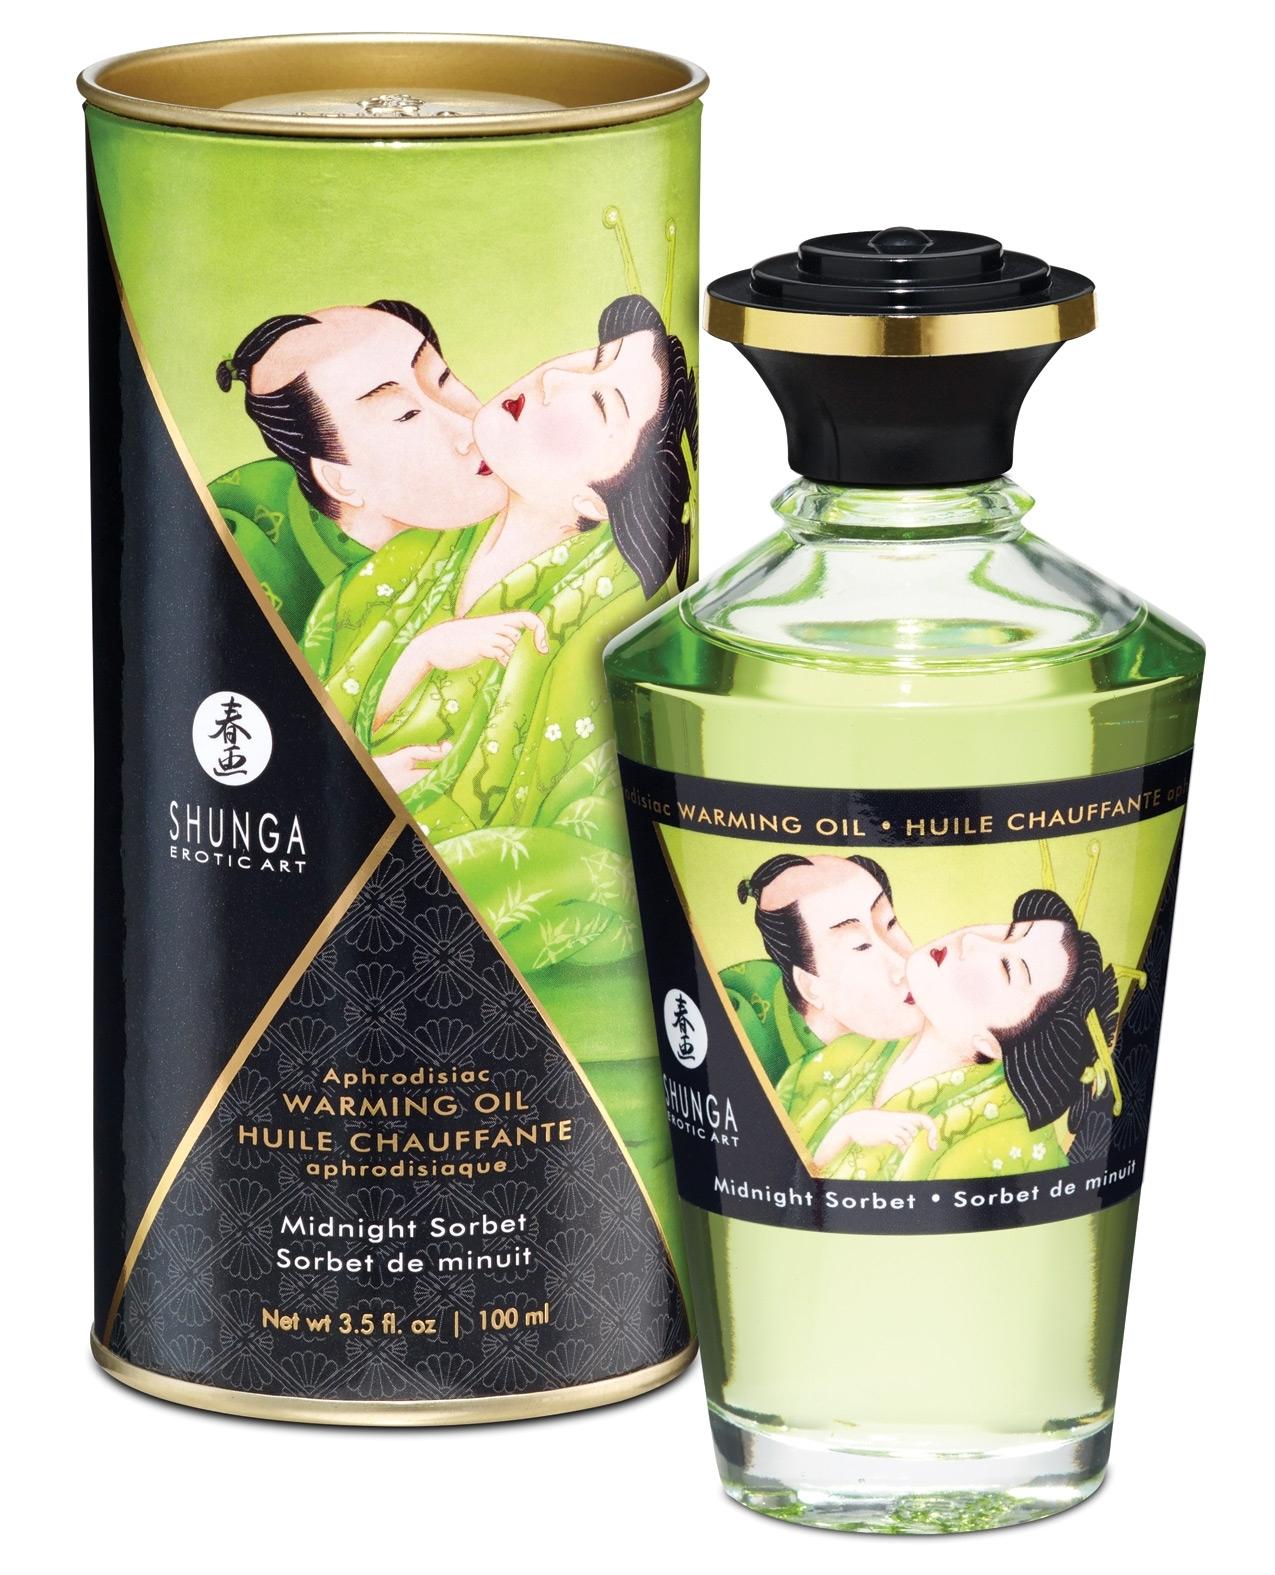 Shunga Warming Oil Midnight Sorbet - 3.5 oz.